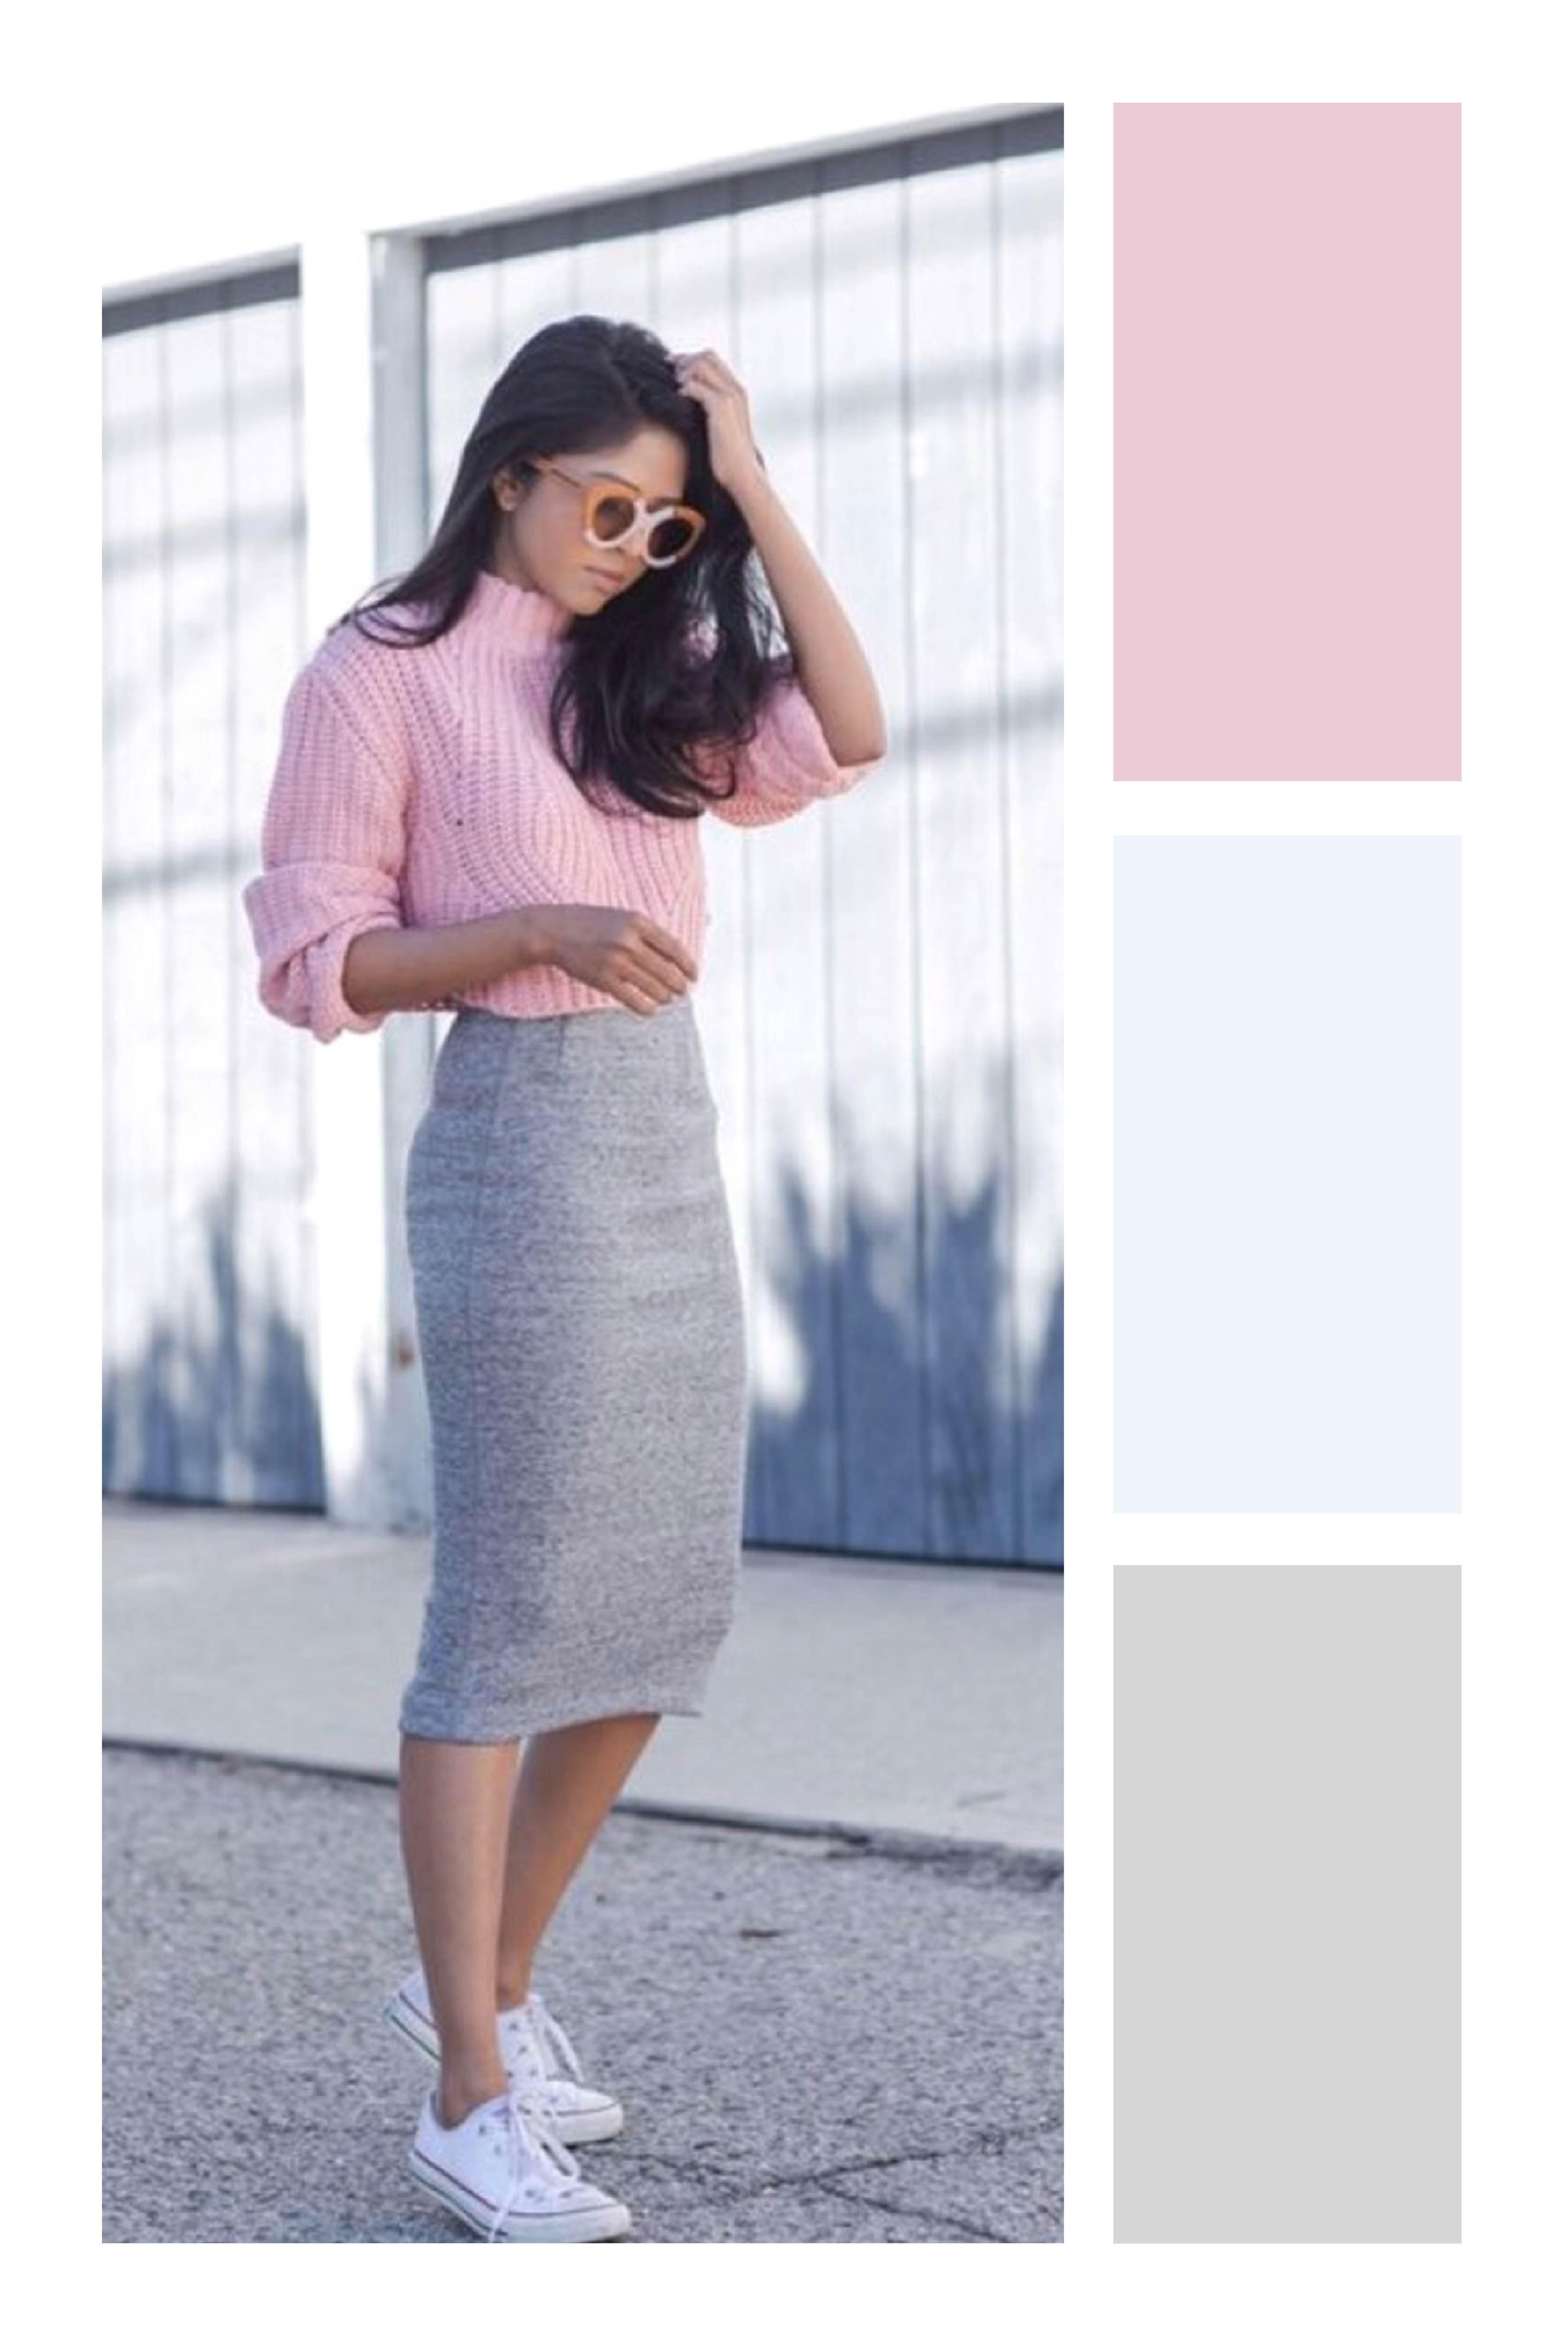 Aprende A Combinar Tus Prendas Favoritas De Color Gris Tizkka Combinar Falda Gris Ropa Ropa De Moda